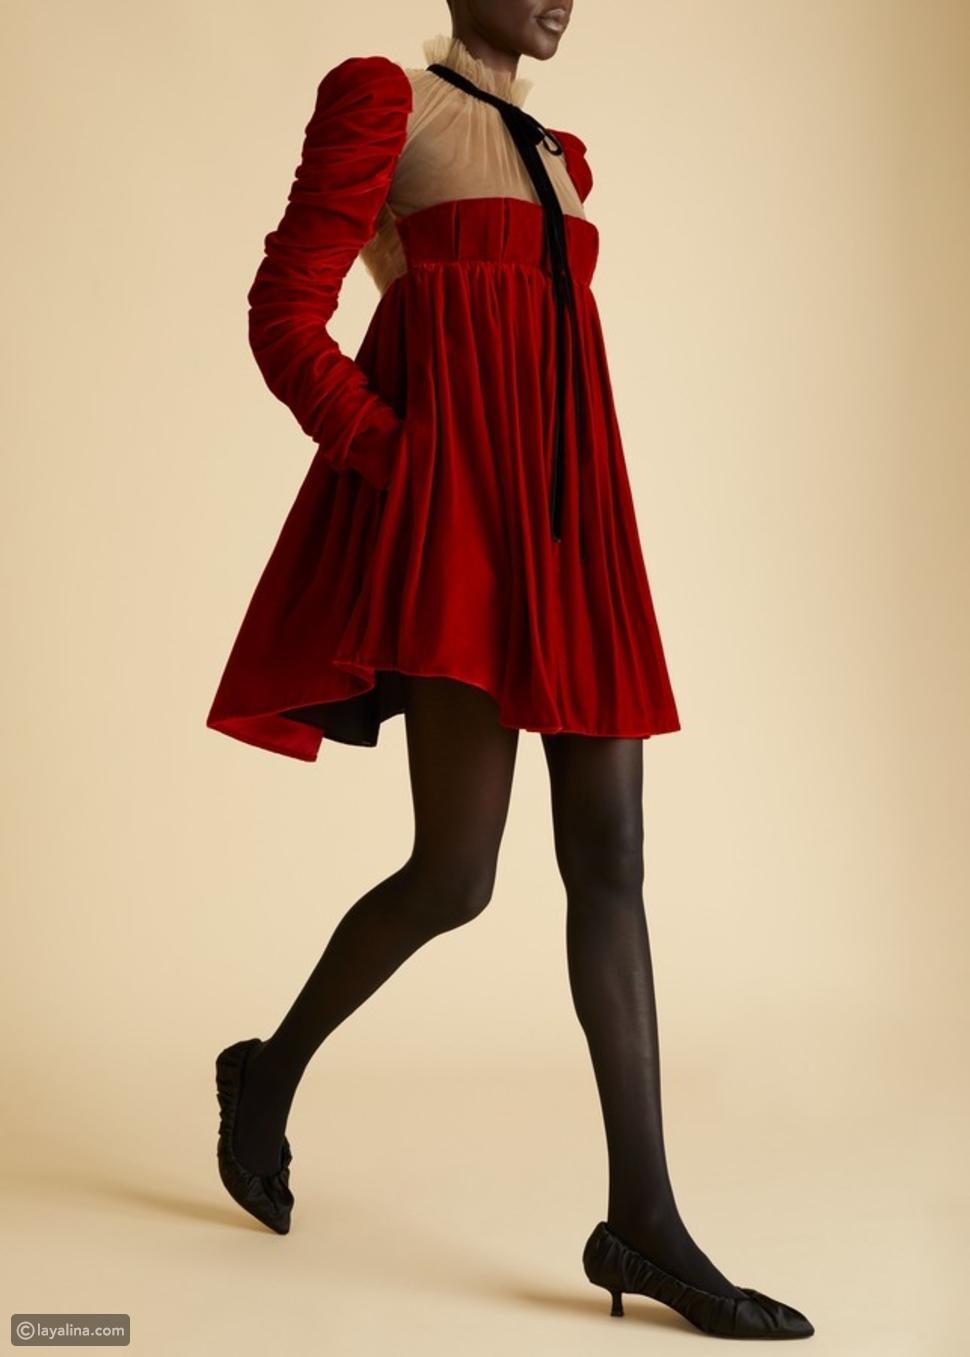 فستان قصيرمخملي من Khaite